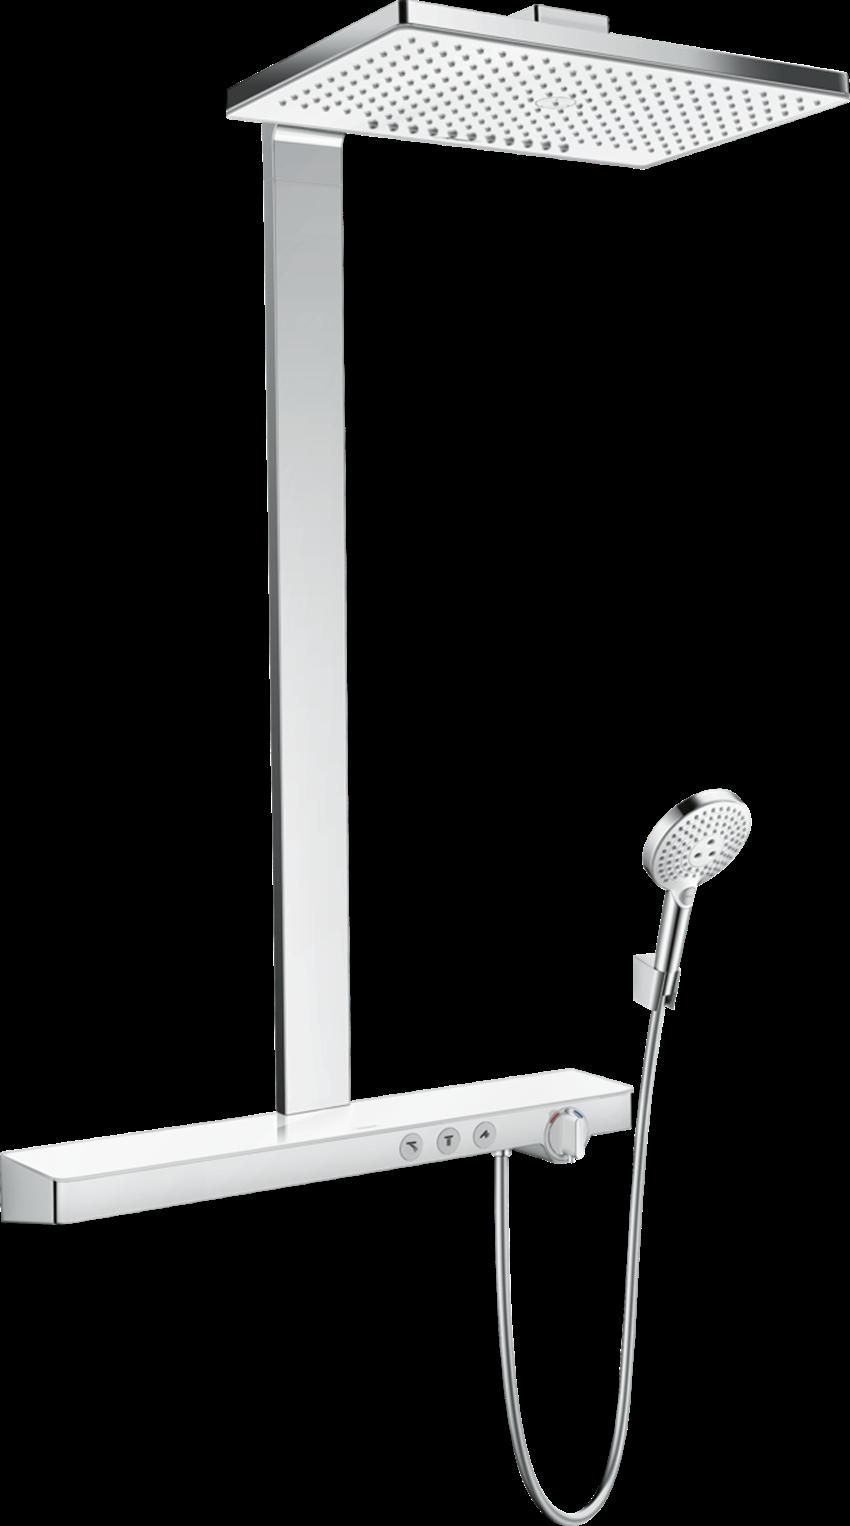 Komplet prysznicowy 460 2jet EcoSmart Hansgrohe Rainmaker Select